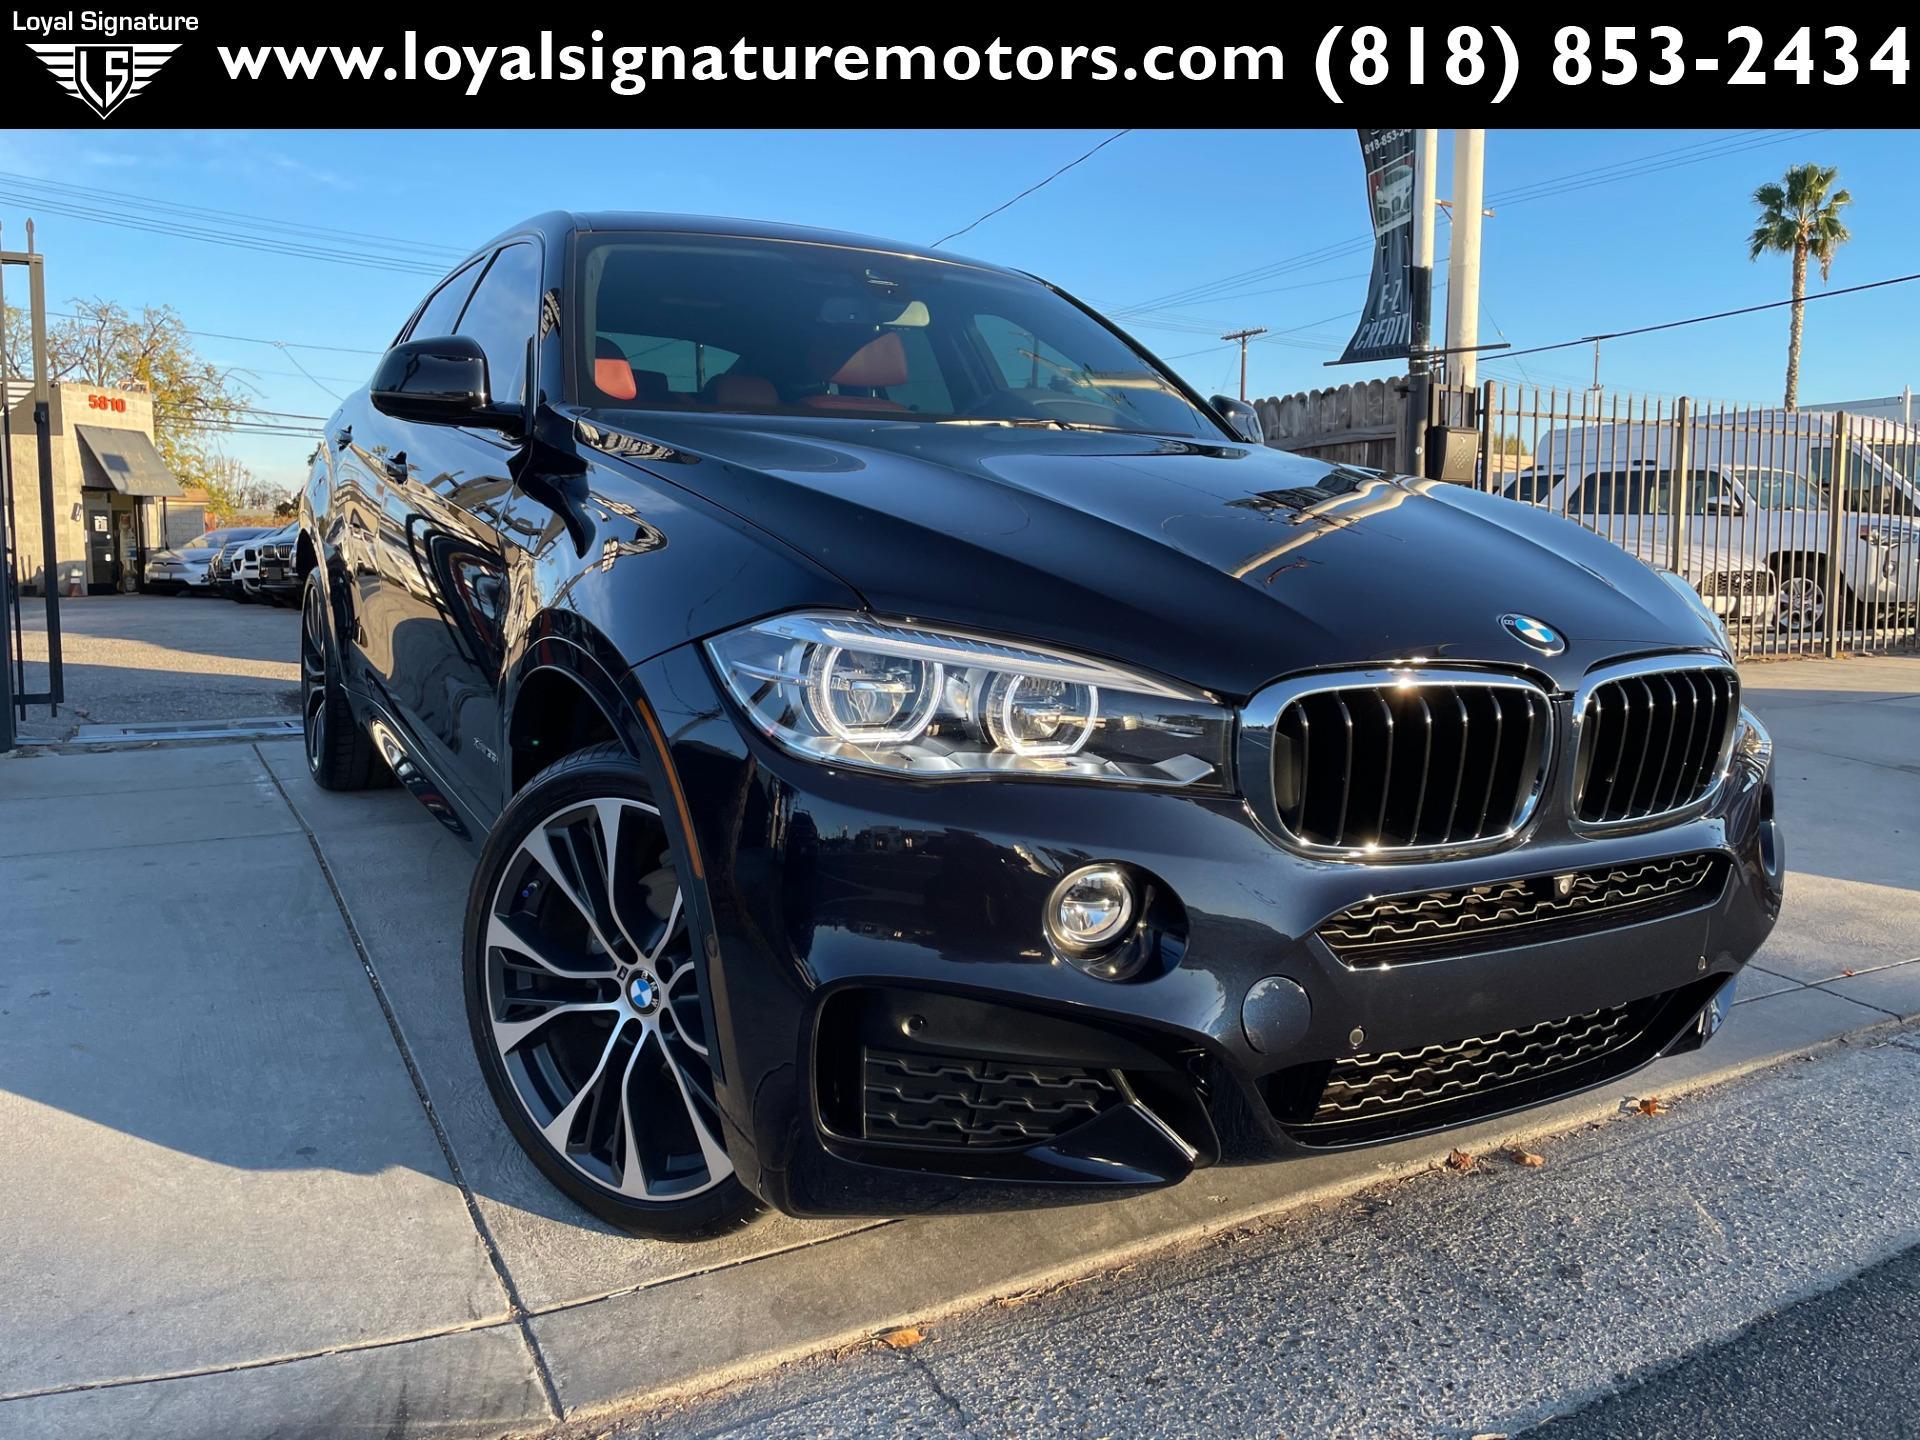 Used 2019 BMW X6 xDrive35i | Van Nuys, CA